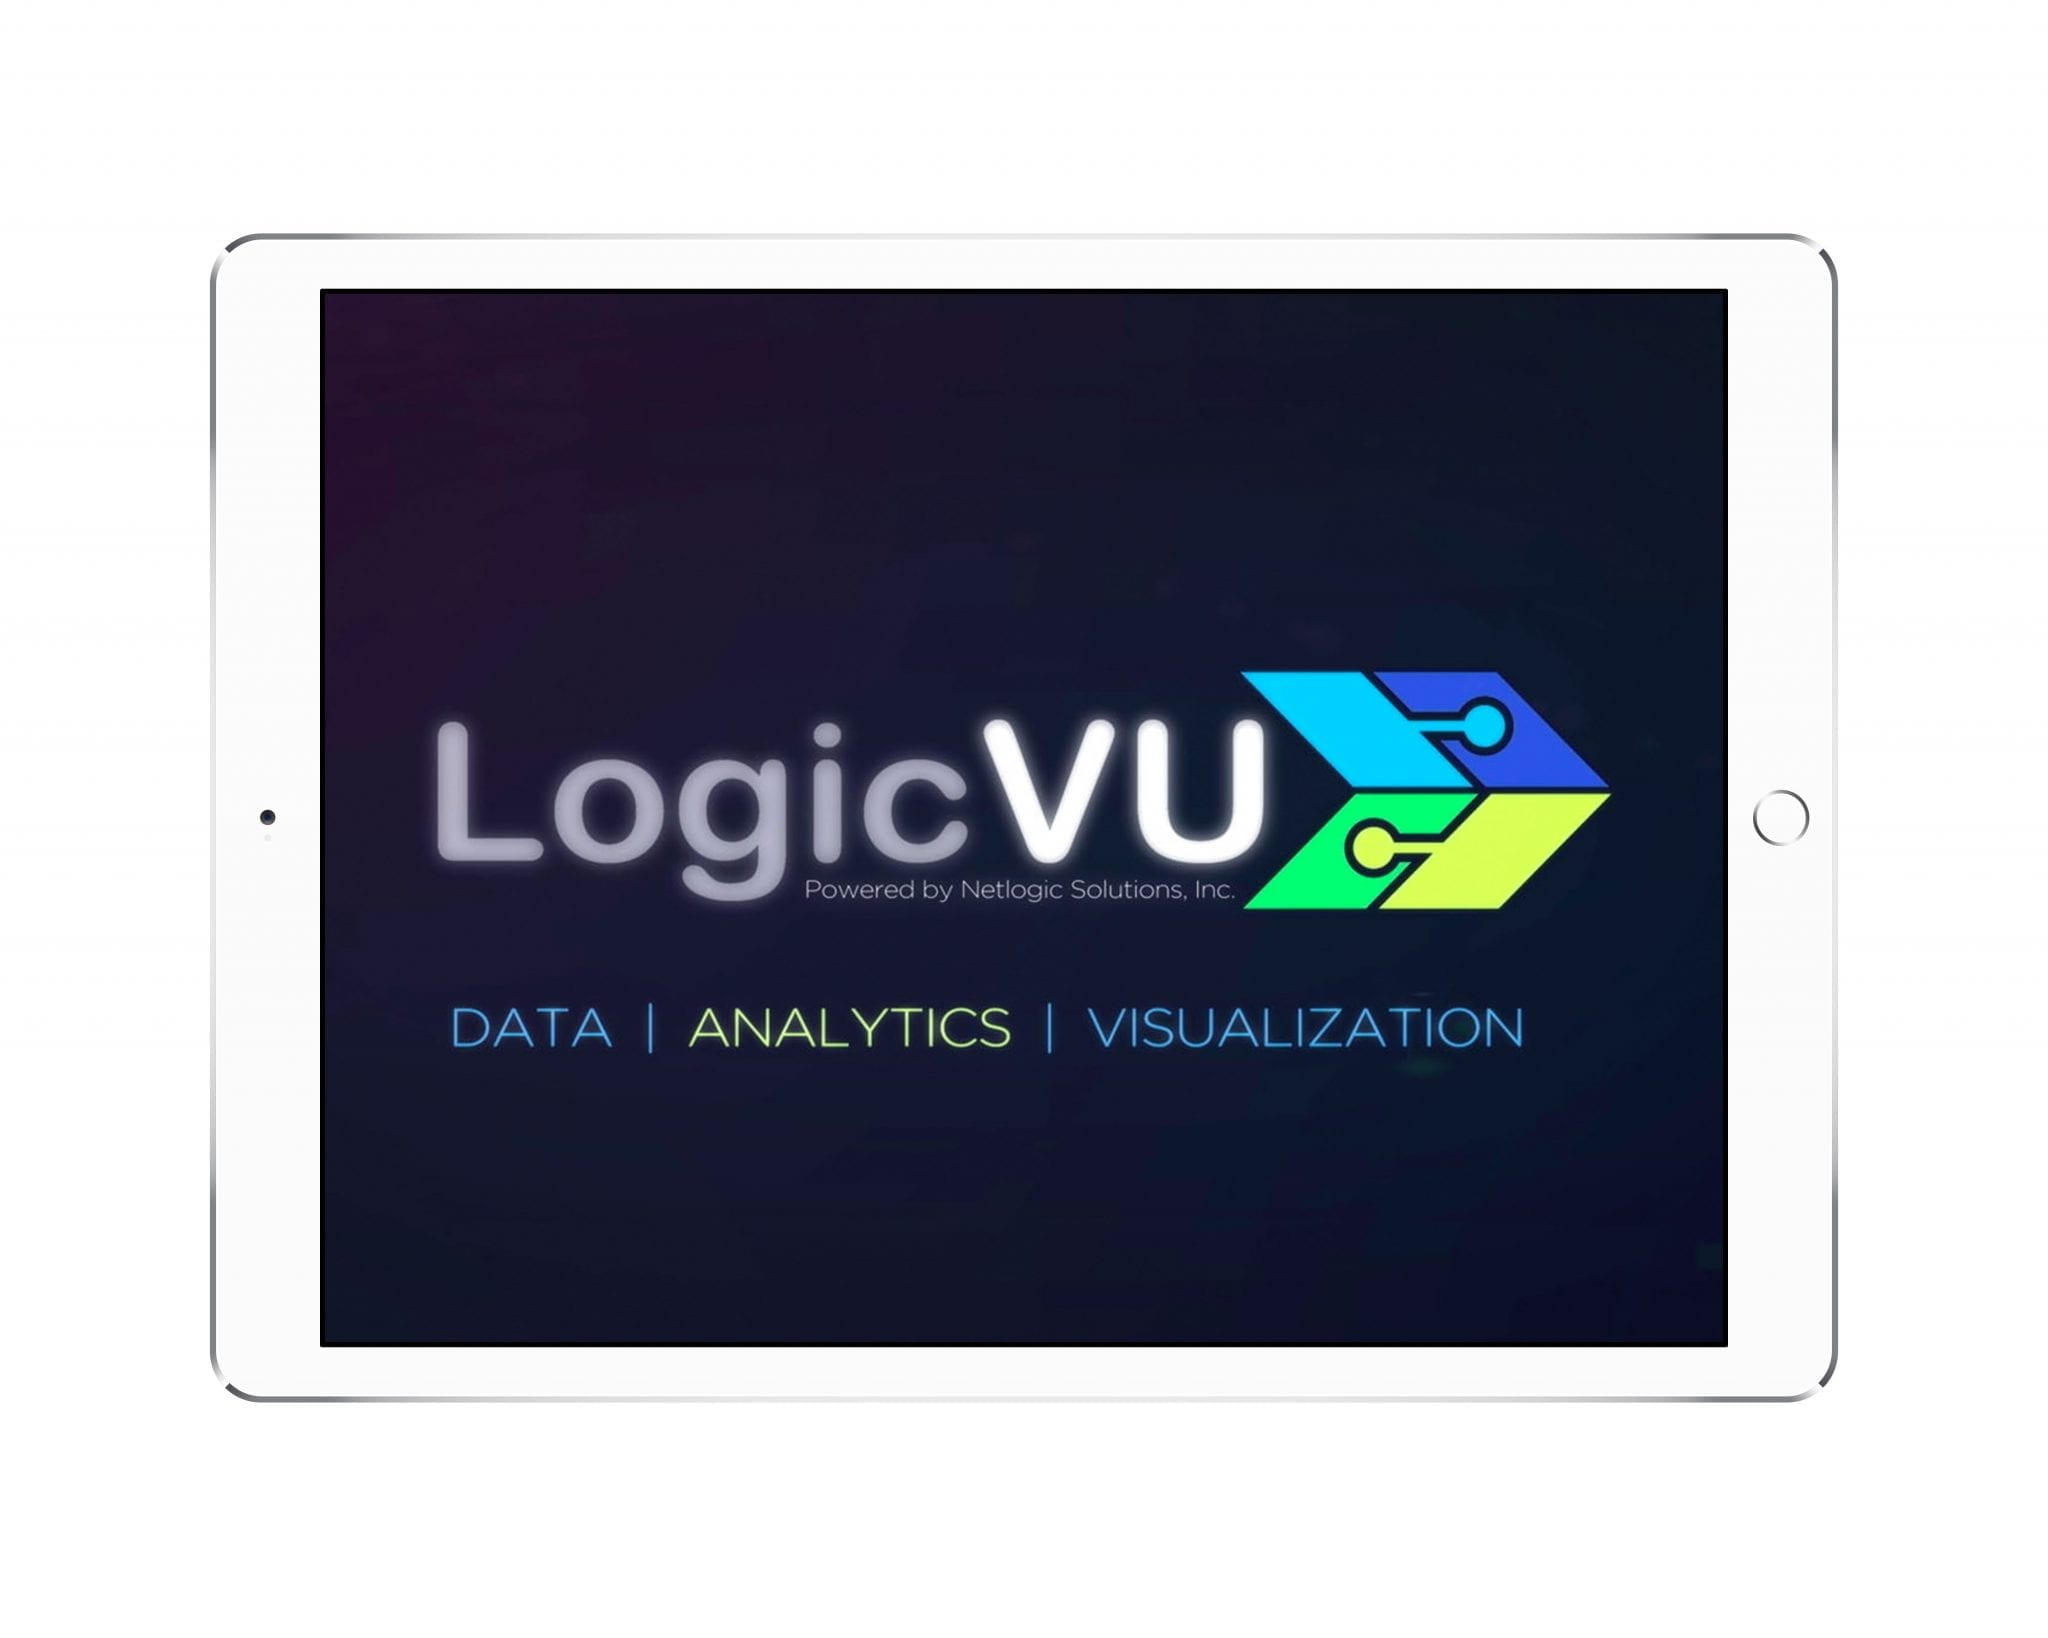 LogicVu BI Product Launch Video